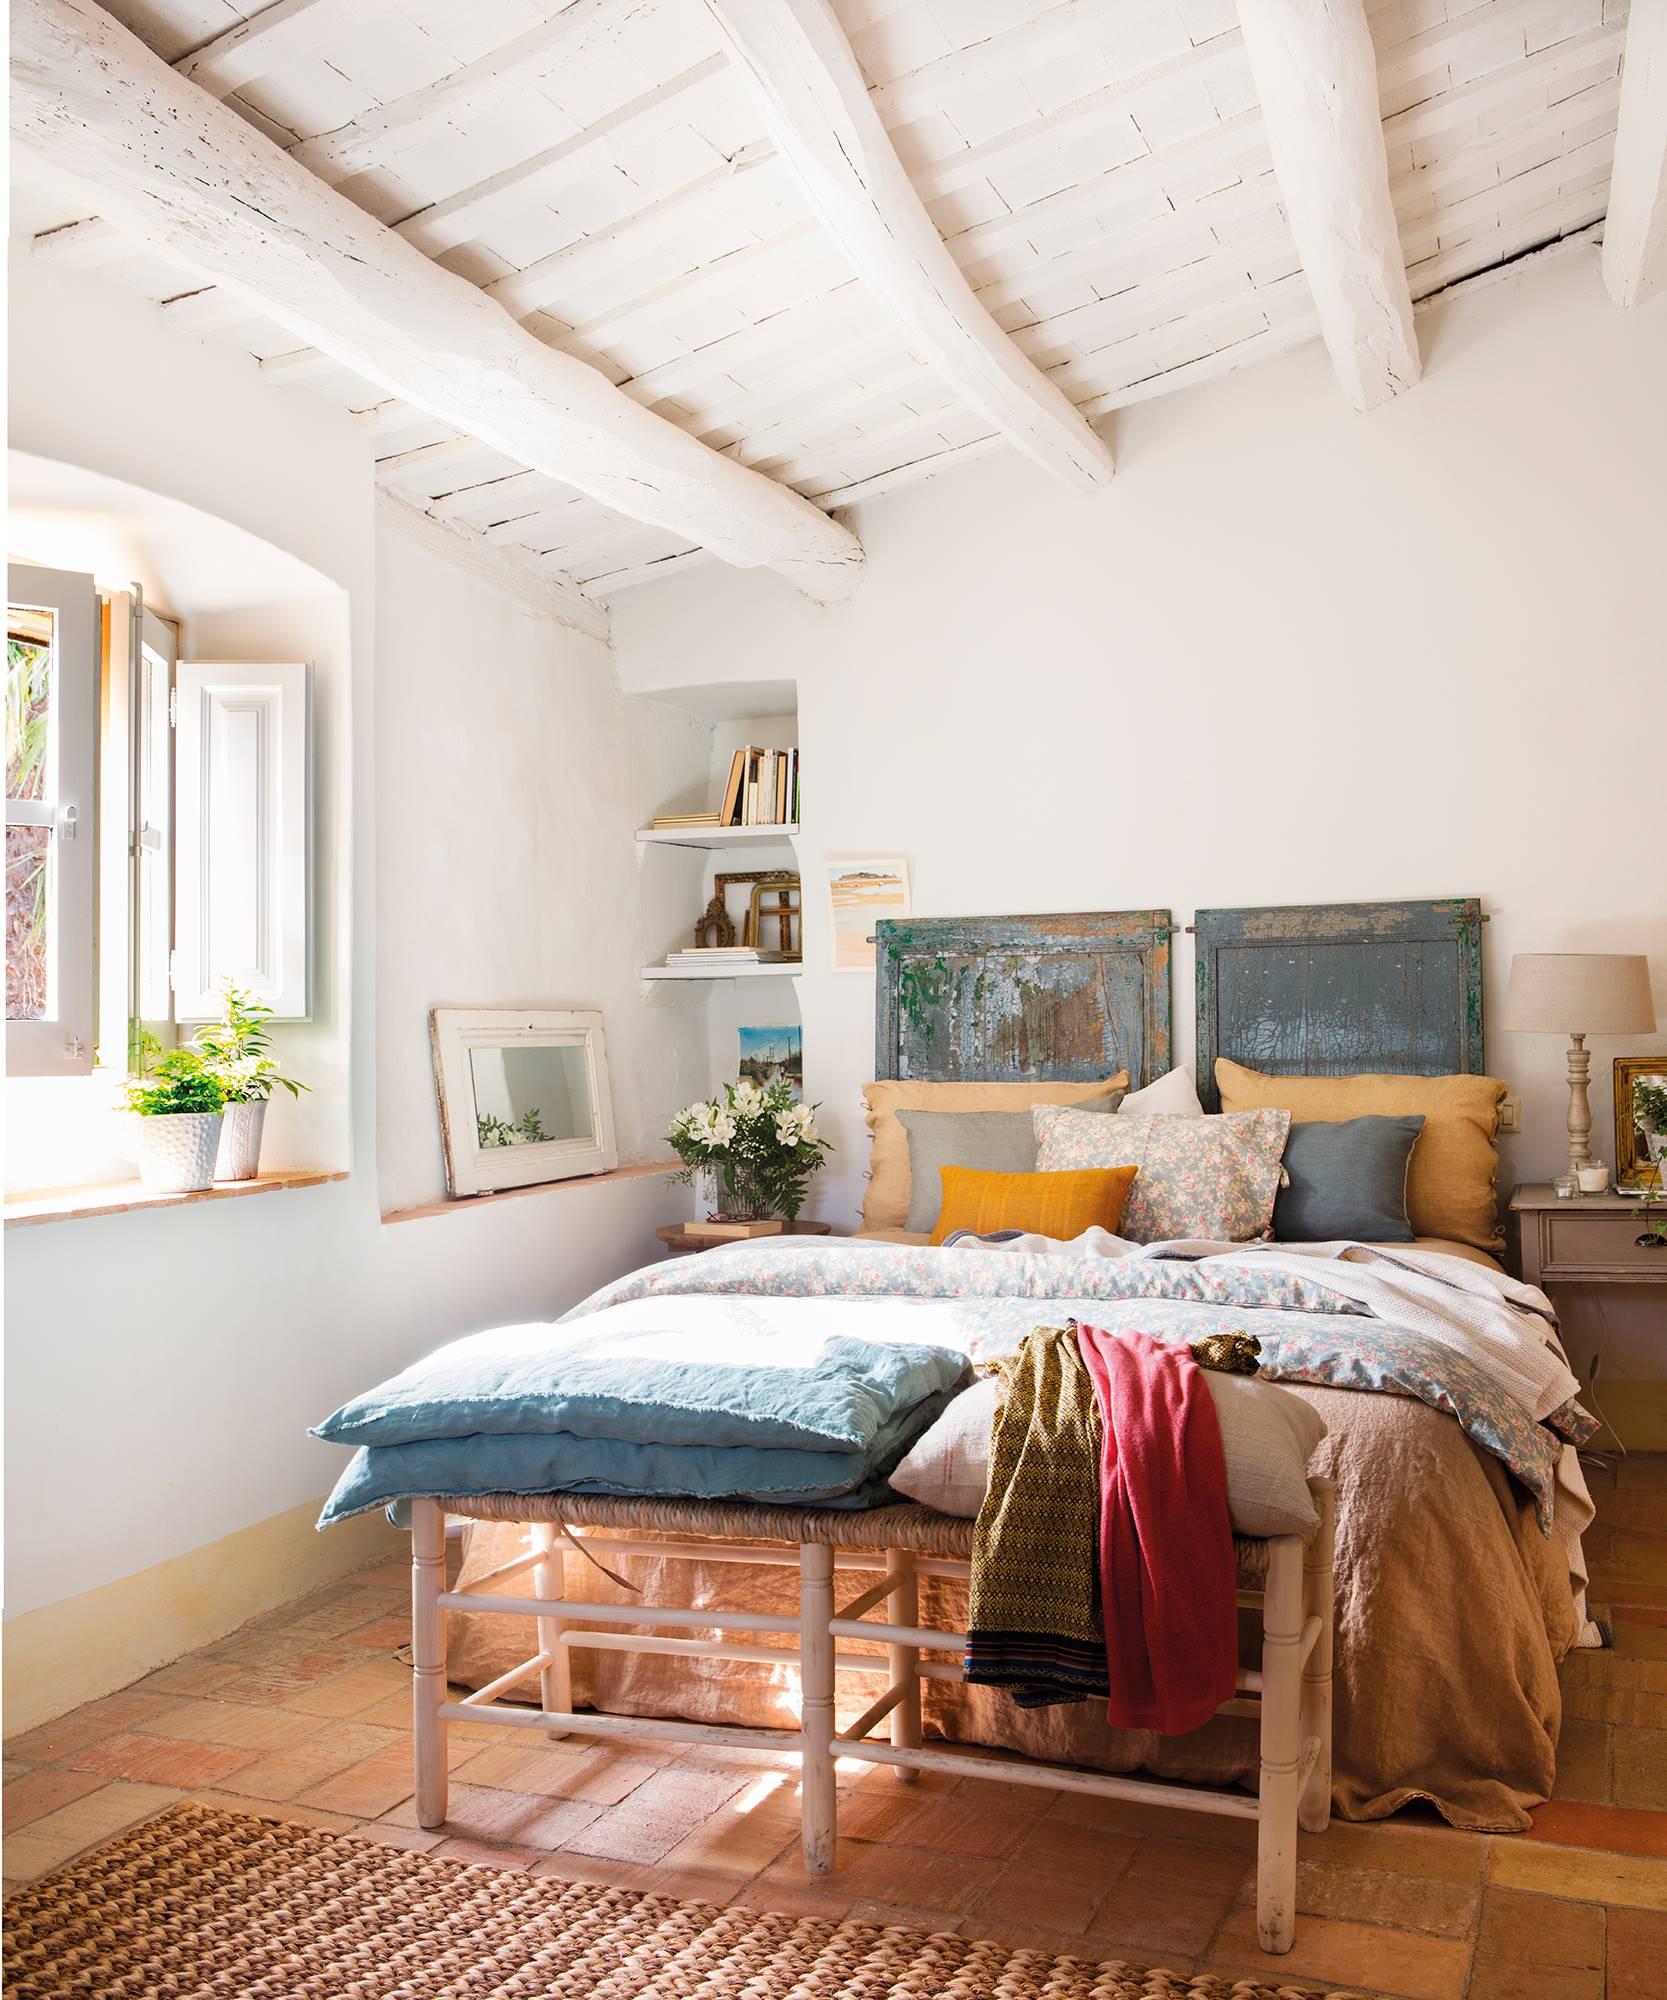 20 trucos baratos e inteligentes para renovar el dormitorio